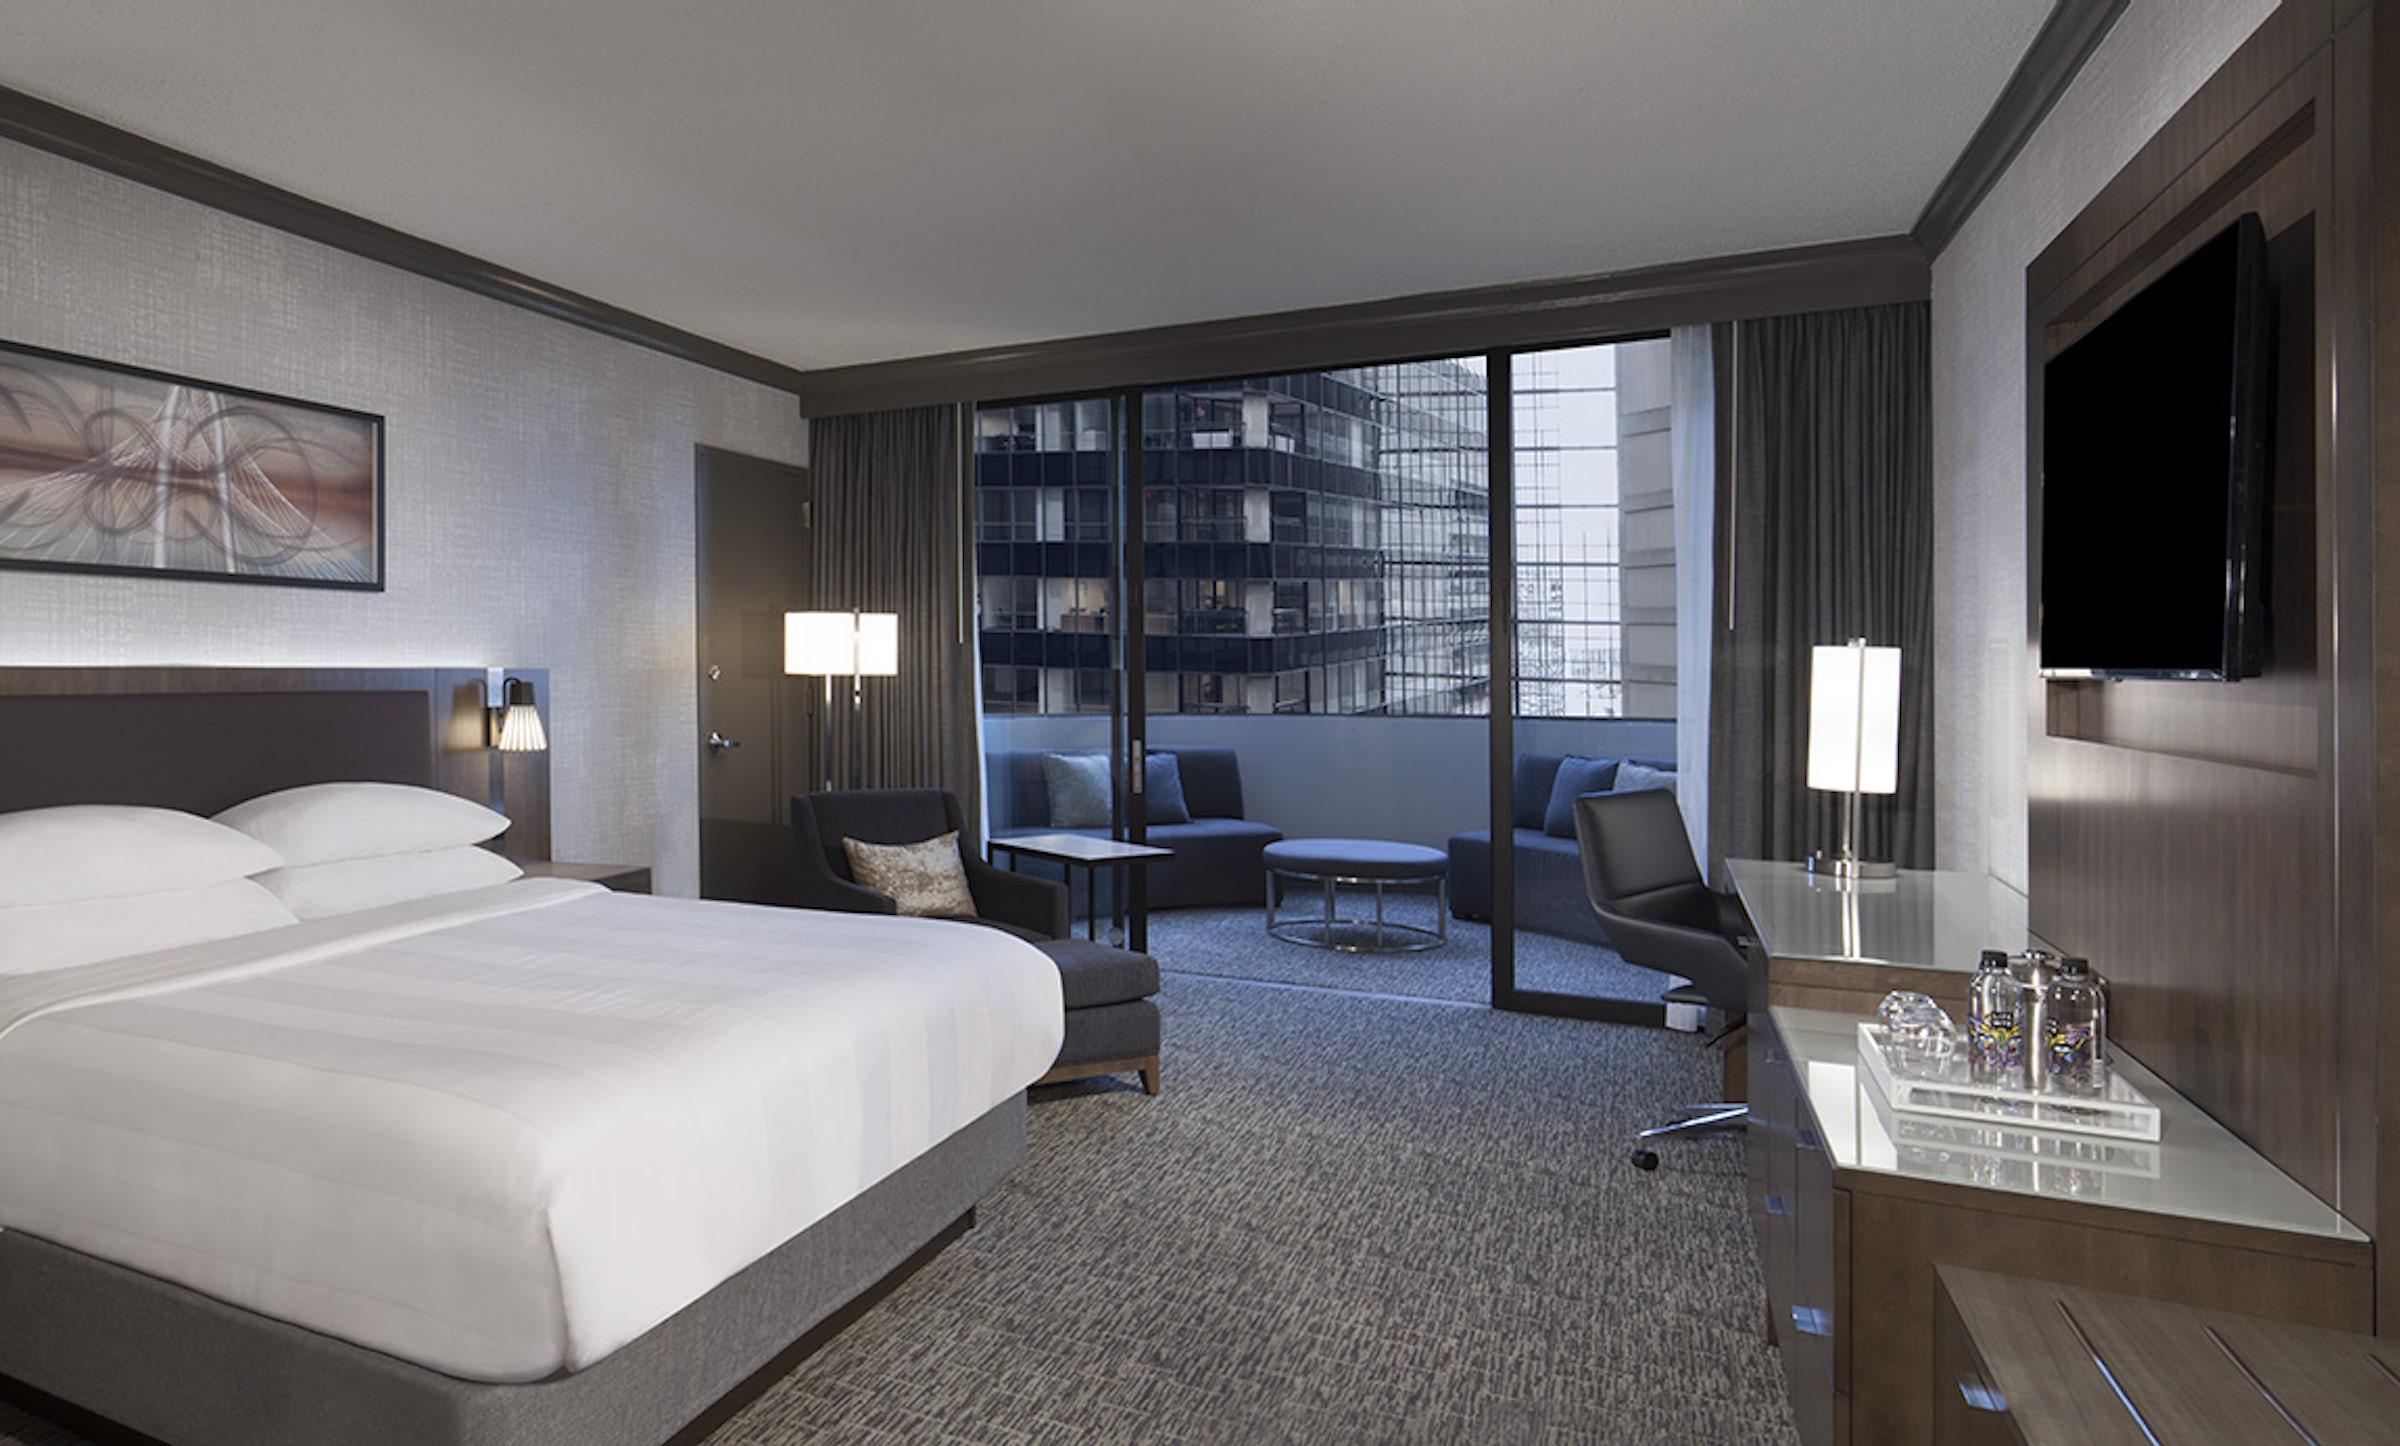 Dallas Marriott Downtown in Beyond Dallas